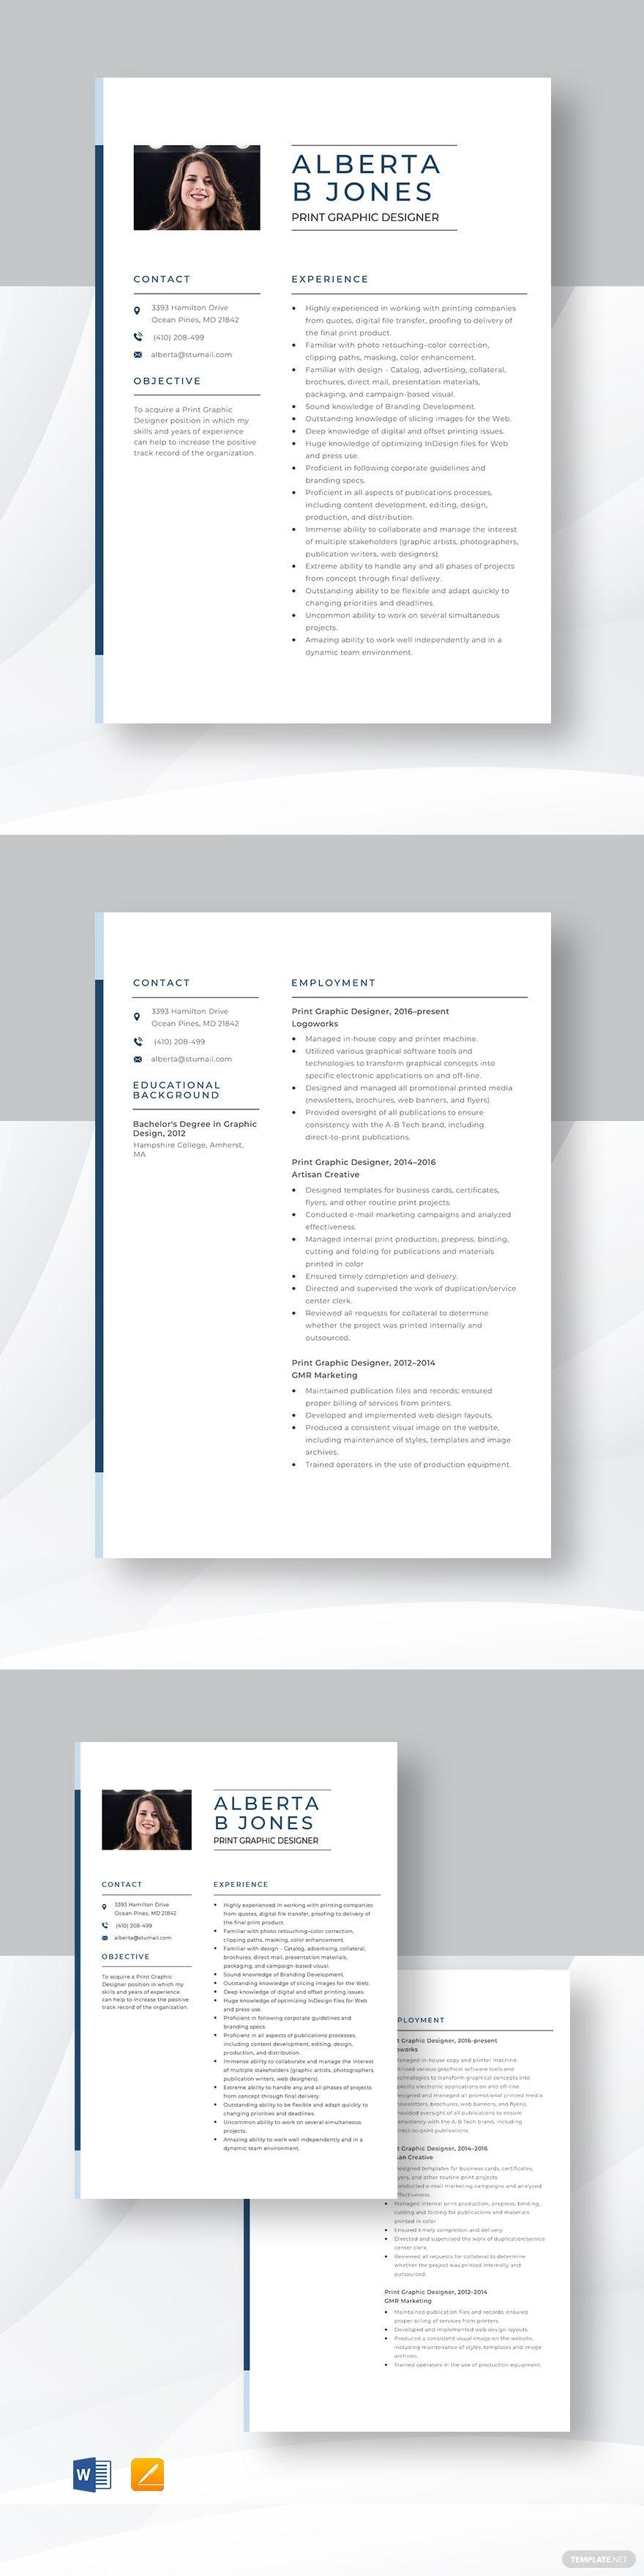 Print Graphic Designer Resume Template in 2020 Graphic